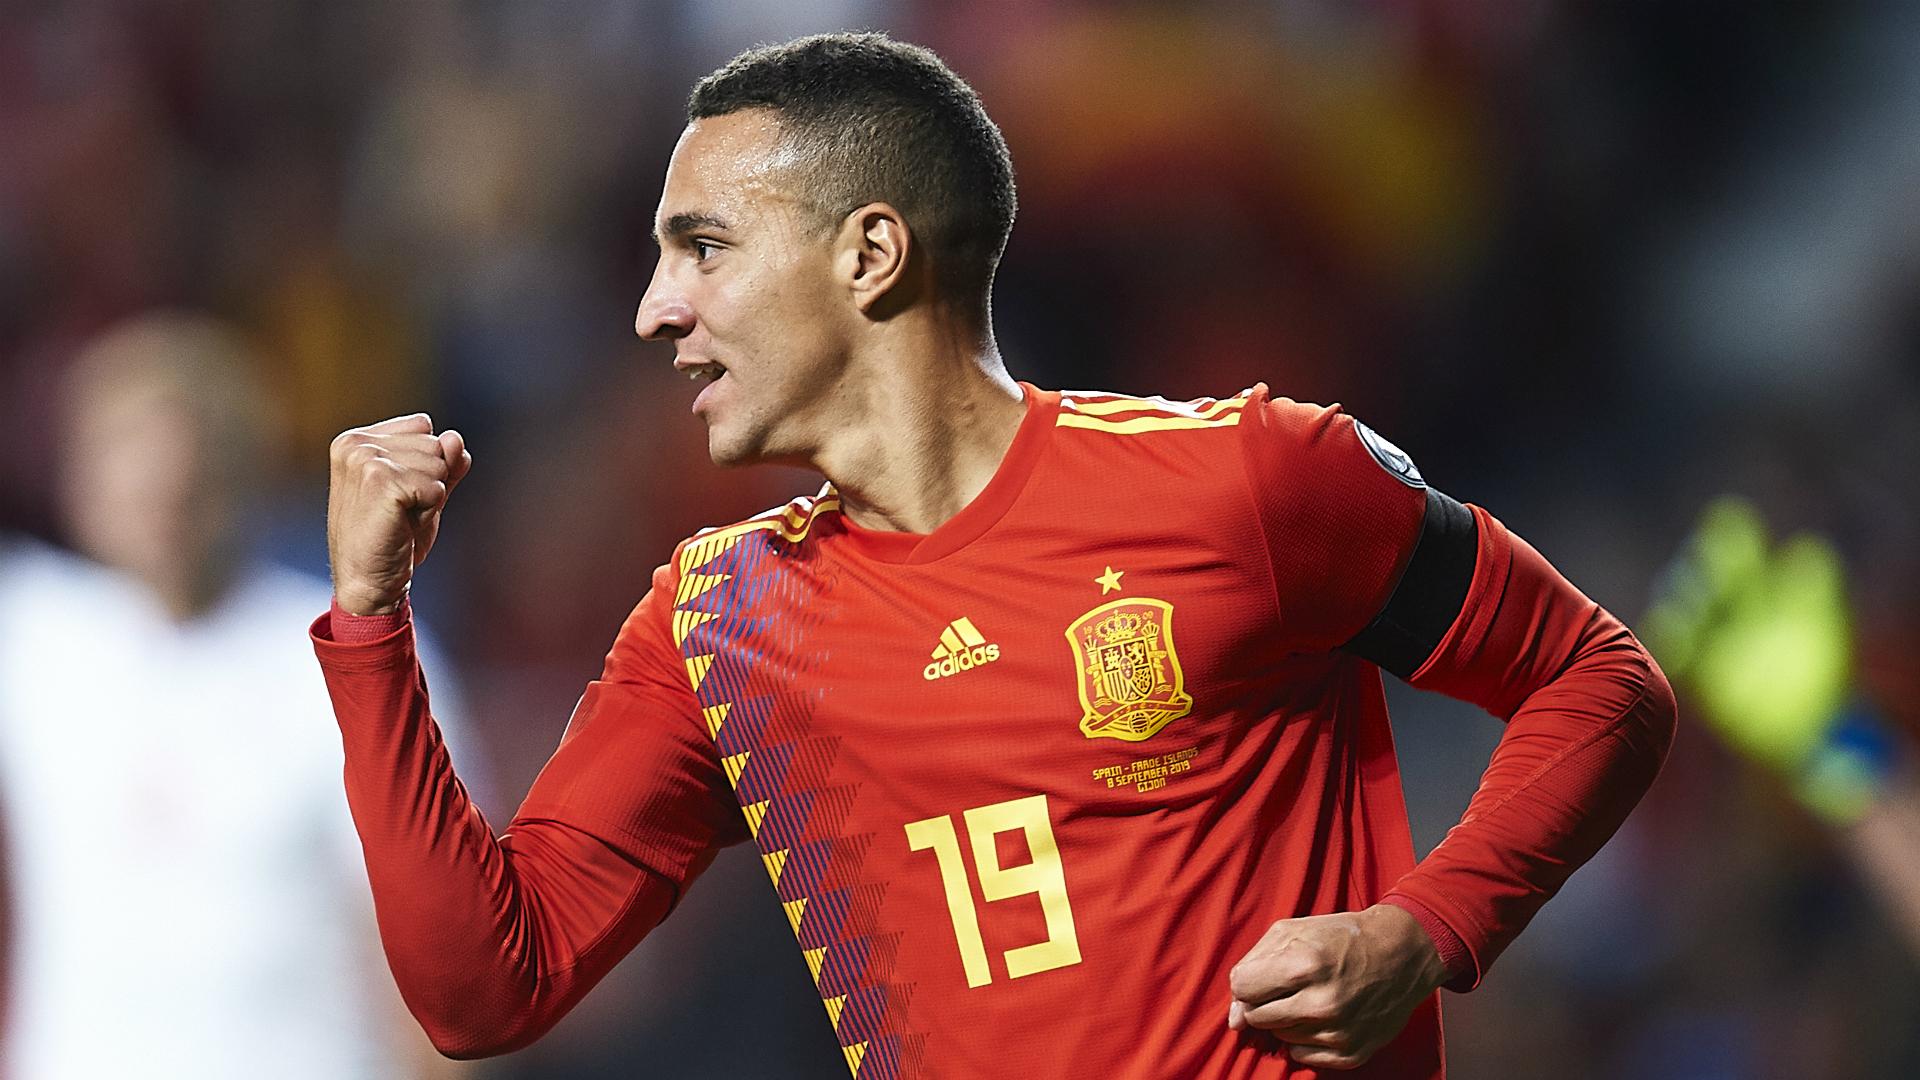 Spain 4-0 Faroe Islands: Rodrigo and Alcacer at the double